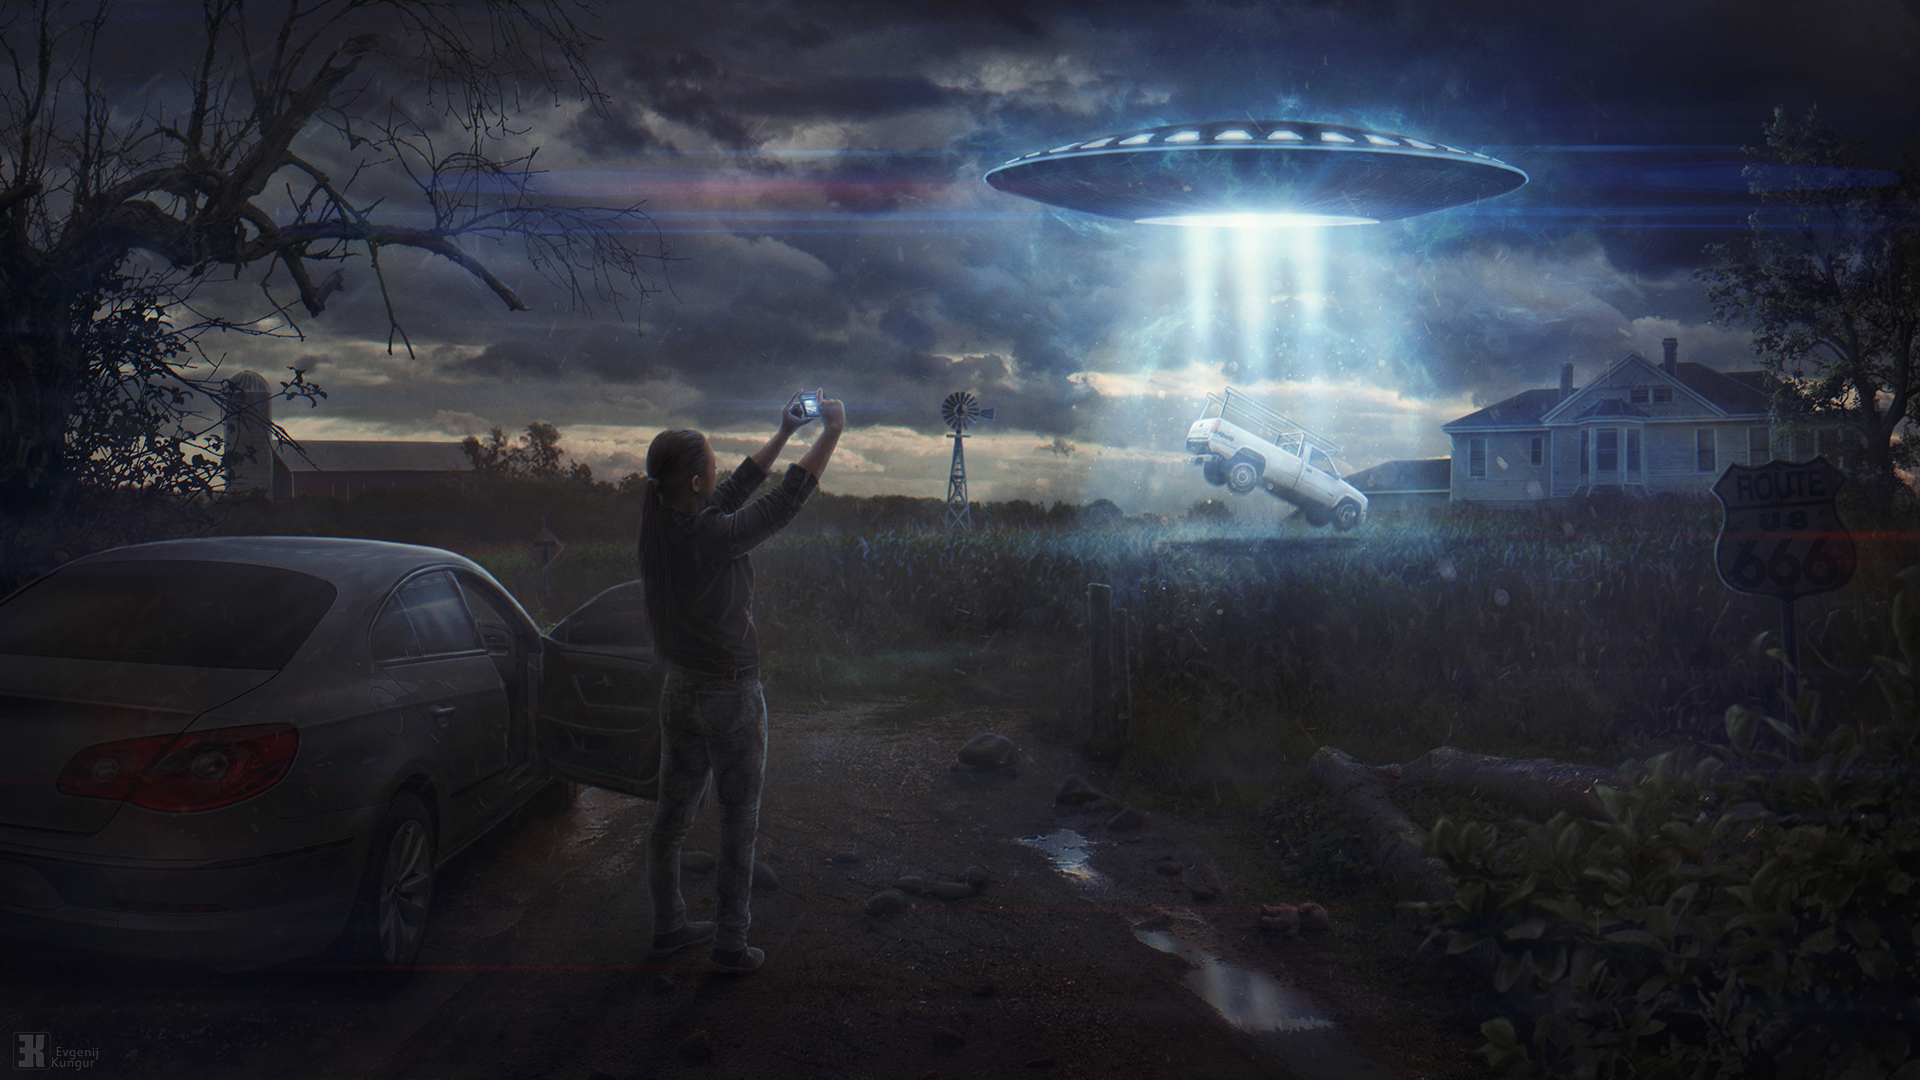 Alien HD Wallpaper Background Image 1920x1080 ID912889 1920x1080